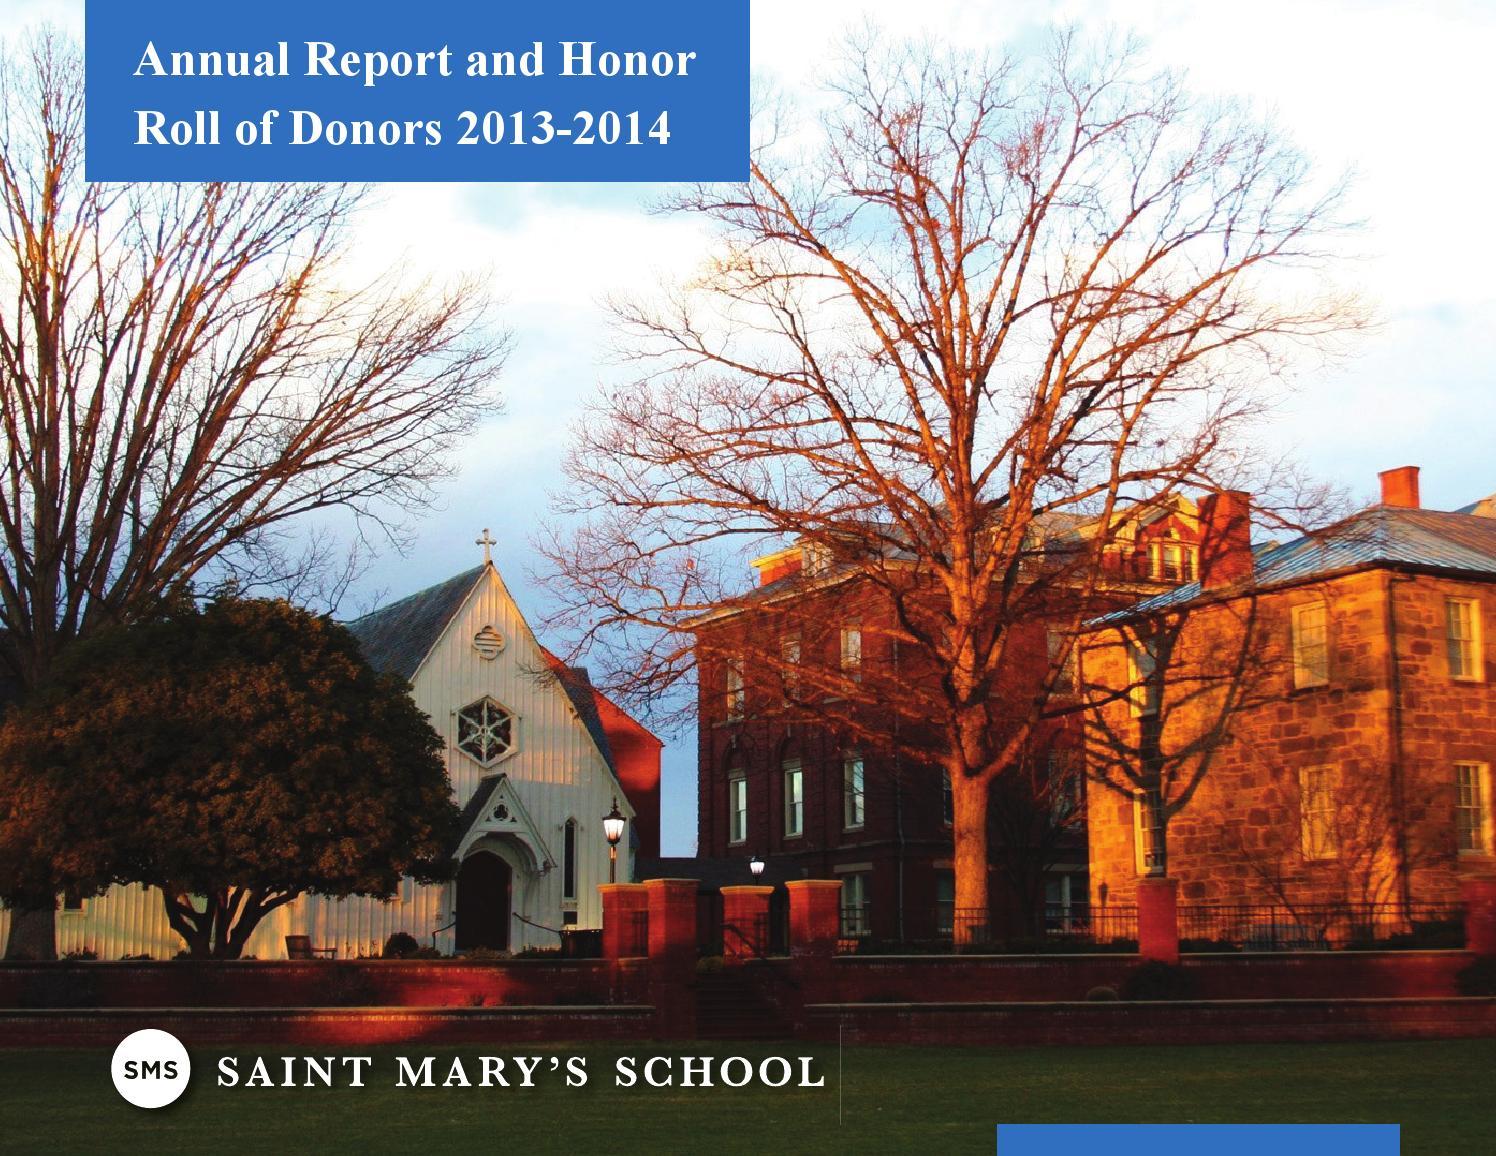 Saint Mary's School 2013-2014 Annual Report by Saint Mary's School ...